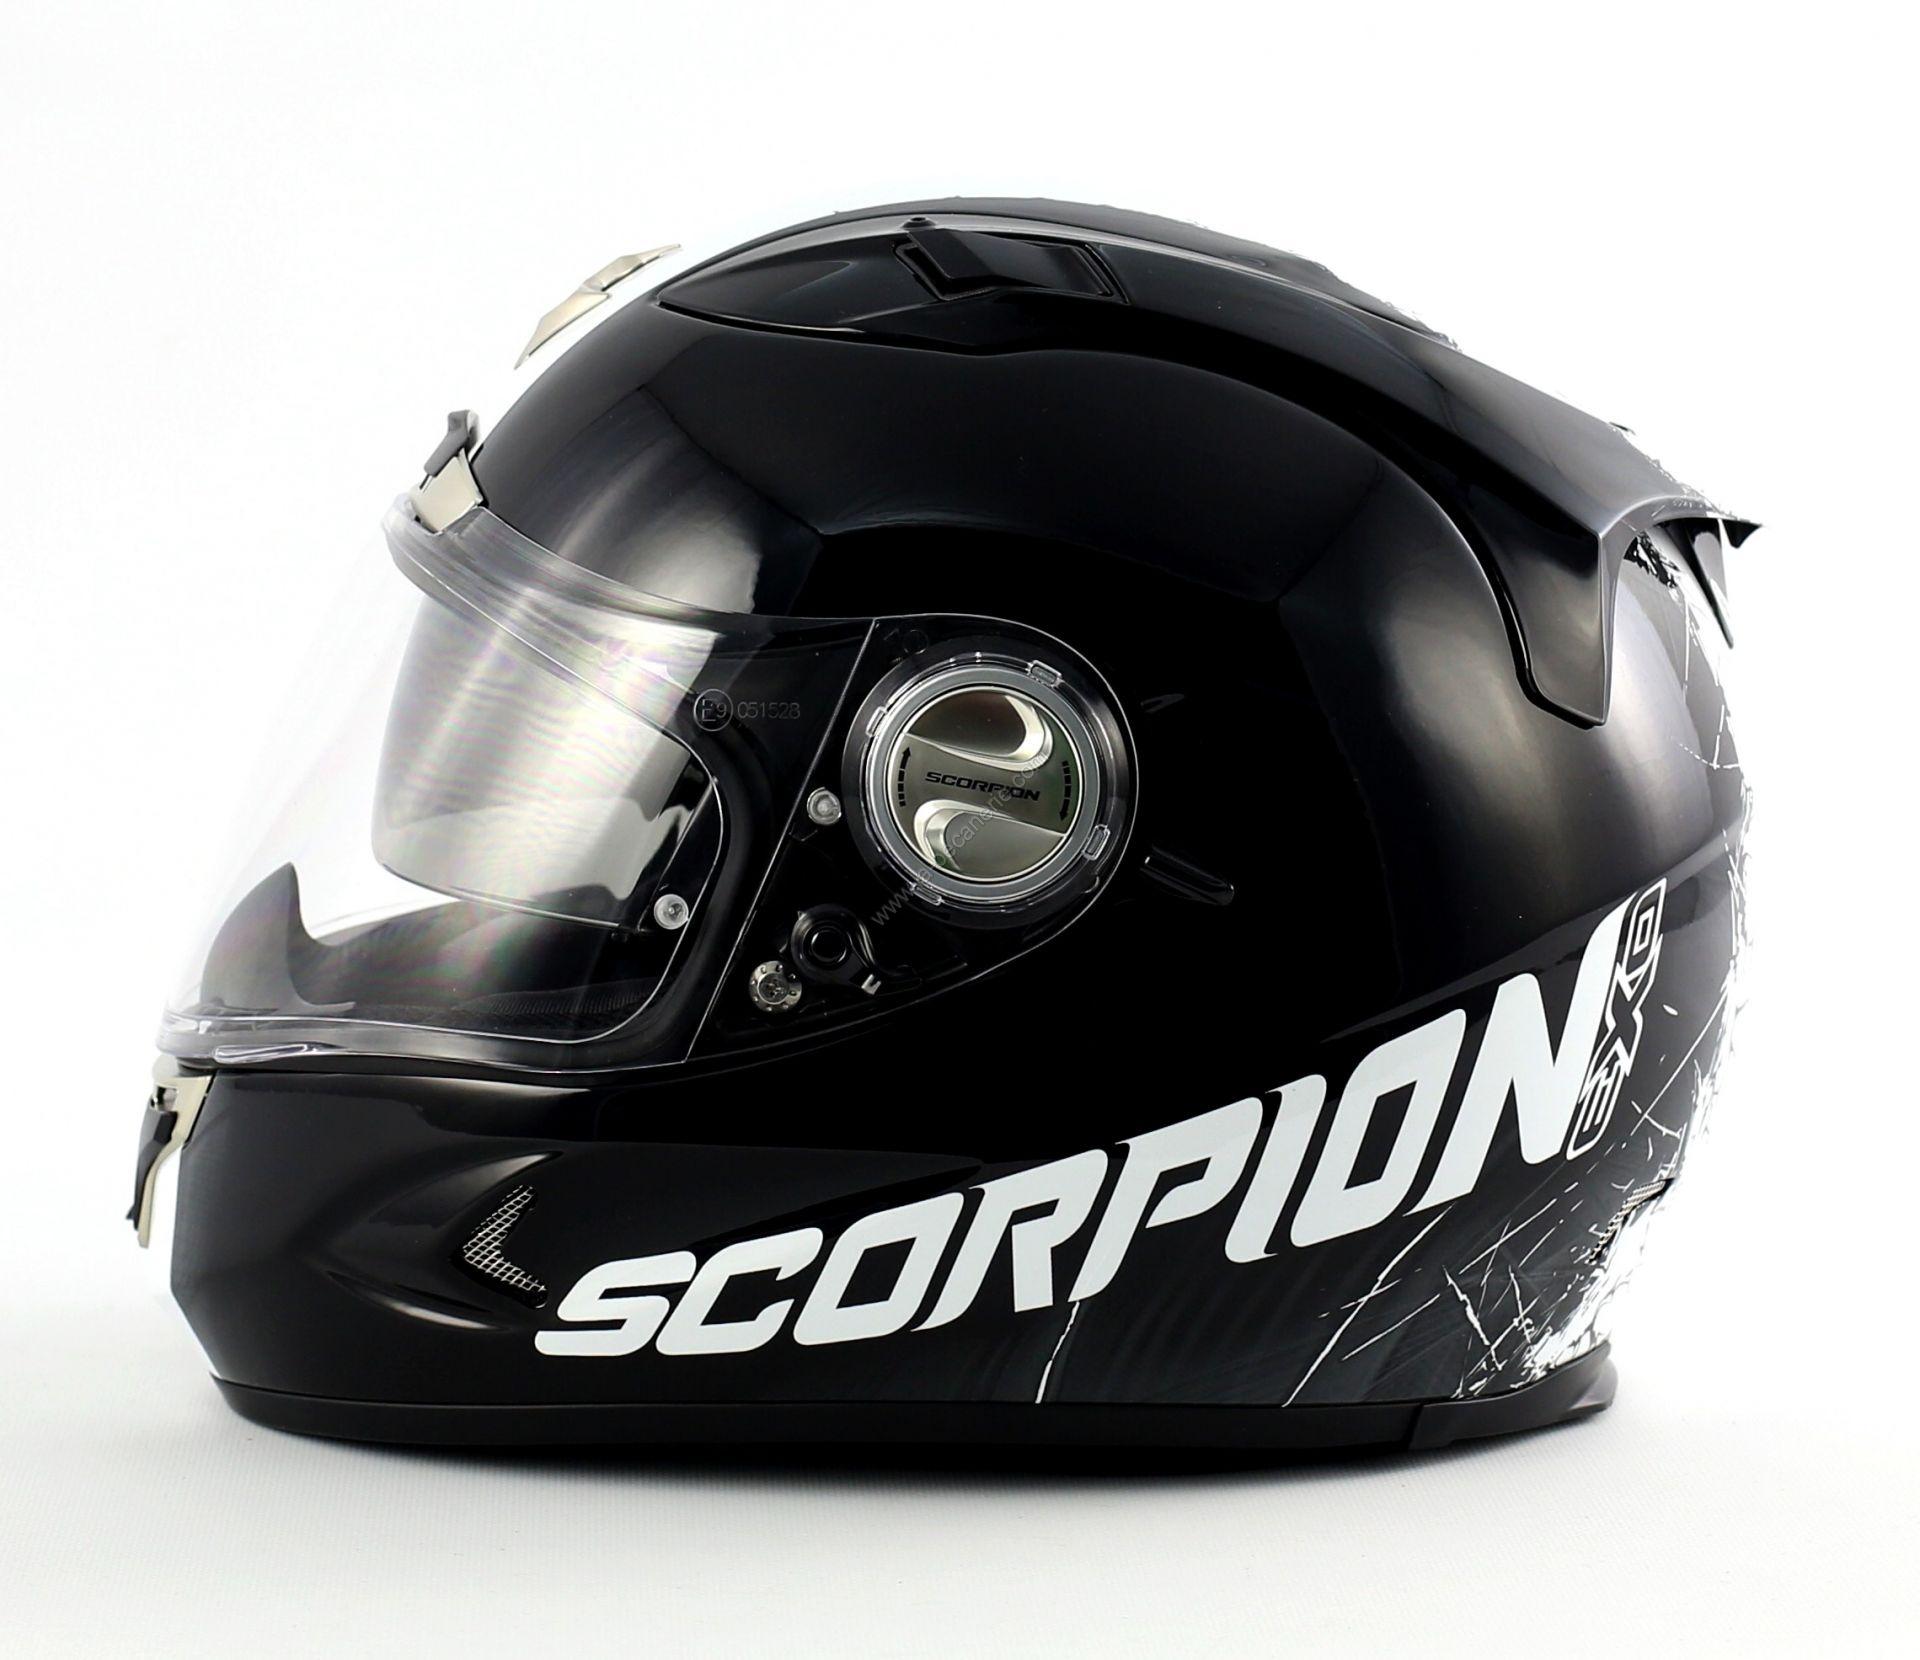 casque int gral scorpion exo 1000 air splitter noir blanc. Black Bedroom Furniture Sets. Home Design Ideas